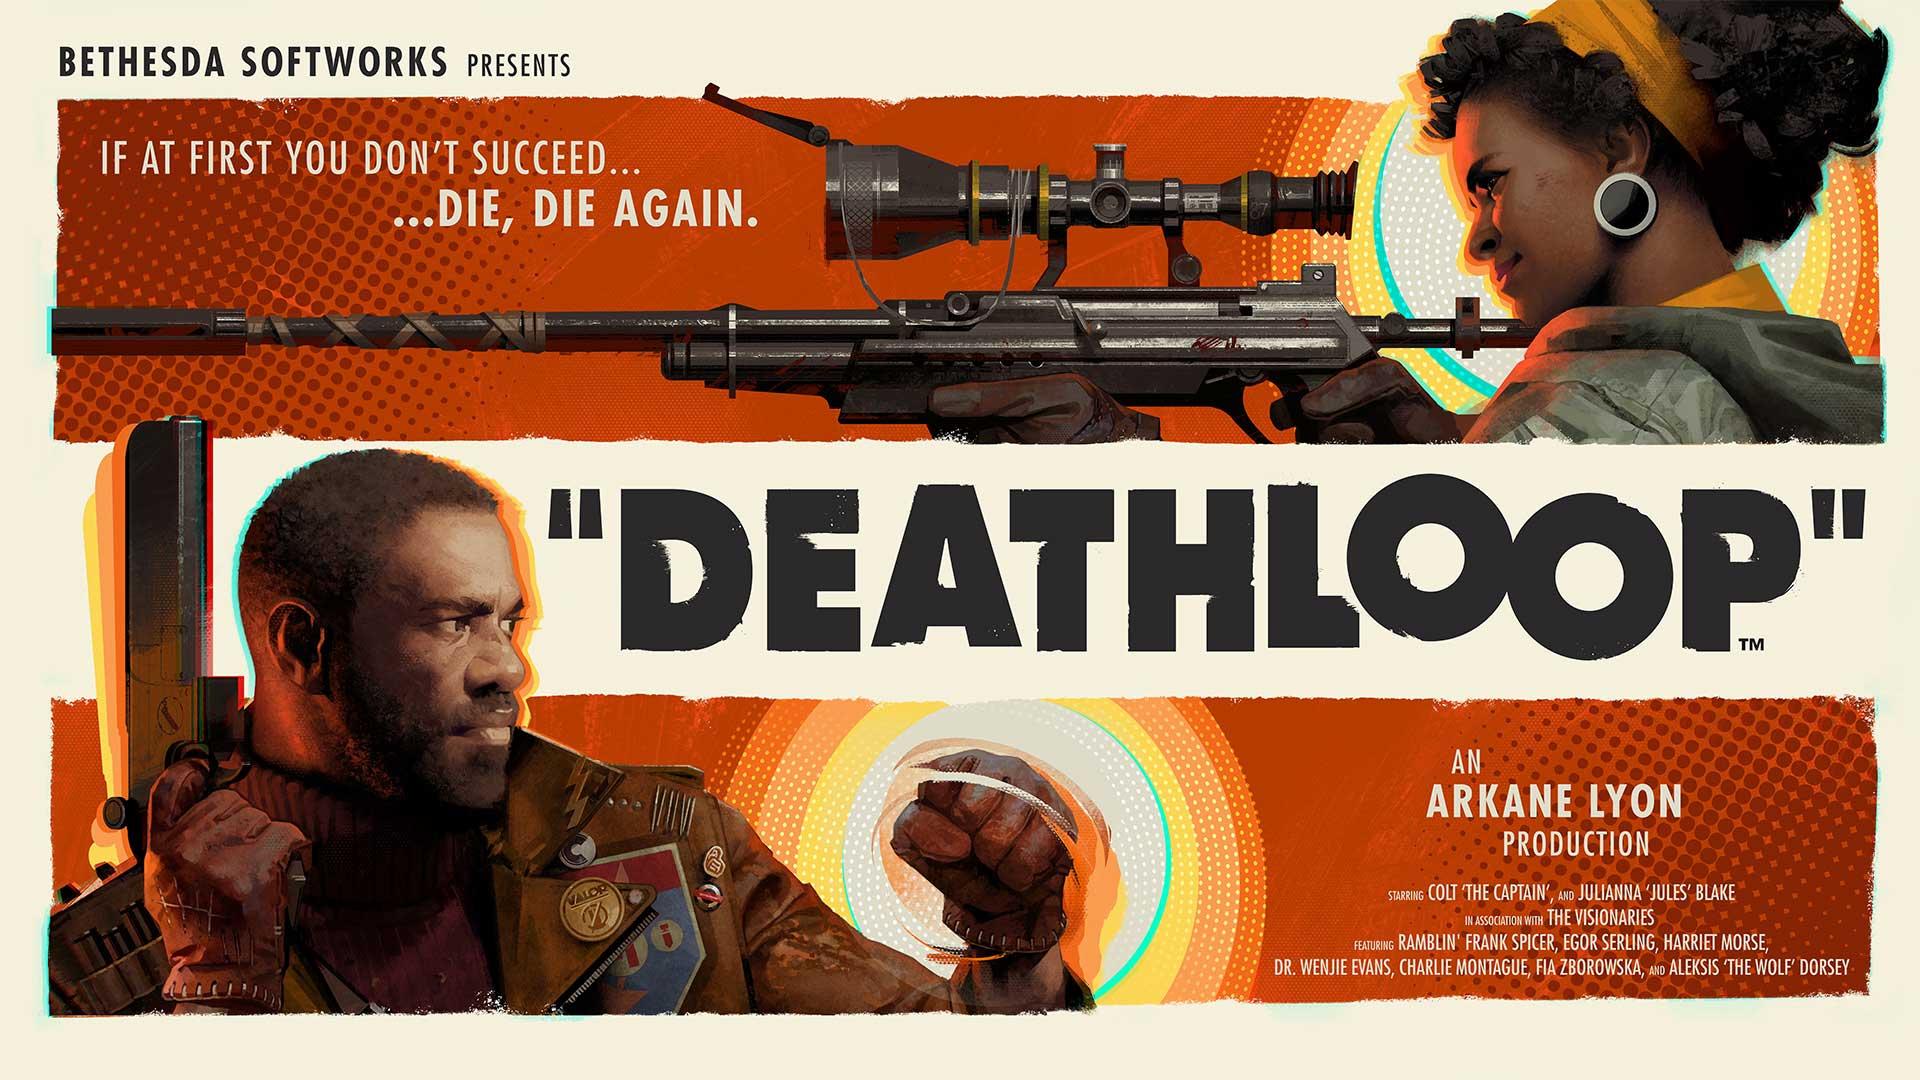 Deathloop Primary Horizontal 1920x1080 01 babt